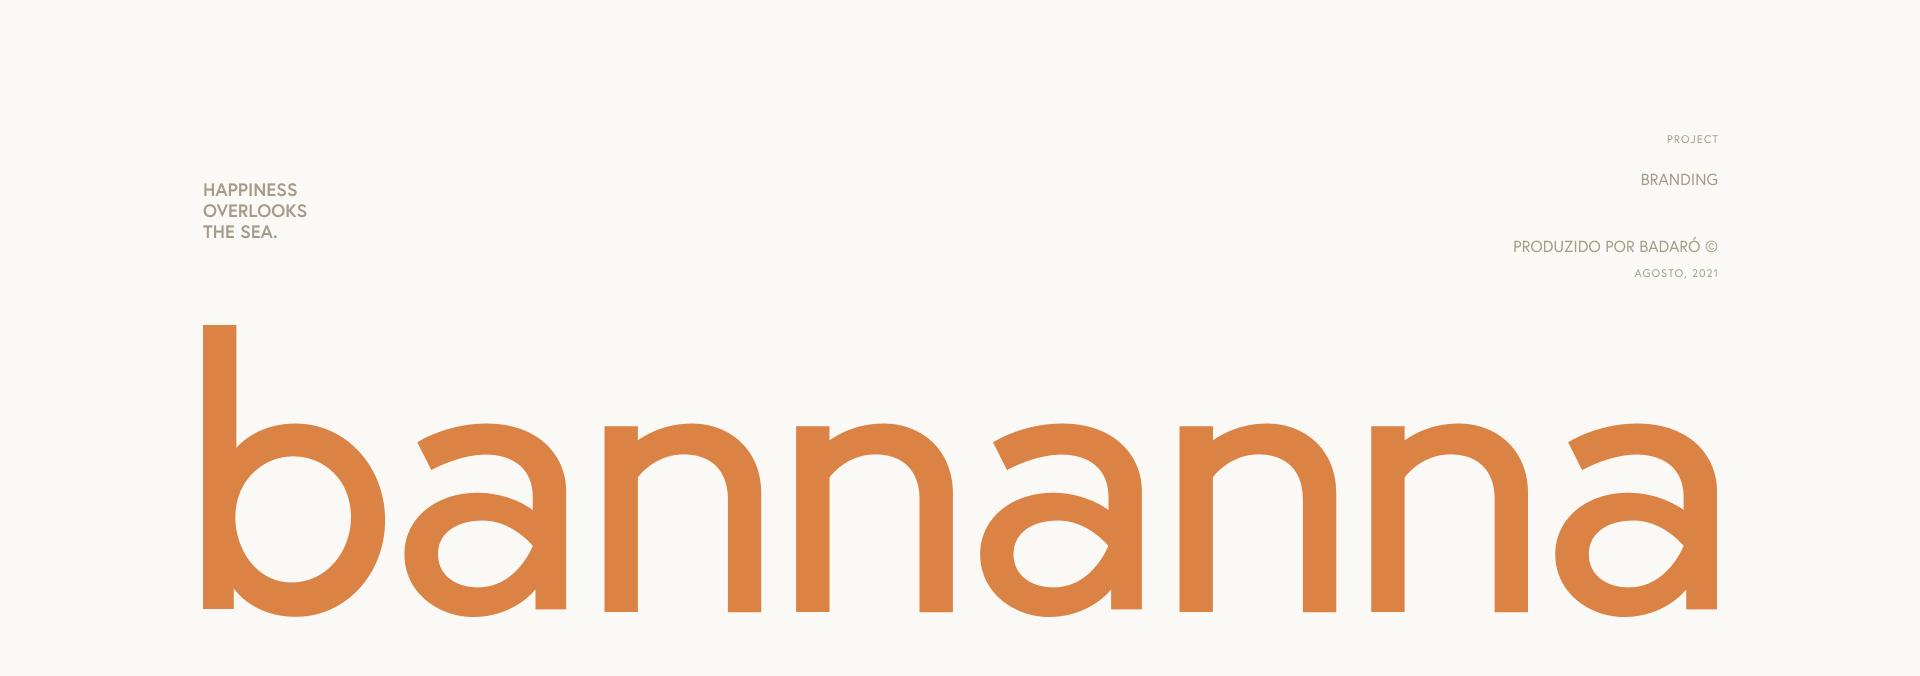 Bannanna-Case-Branding-Badaro